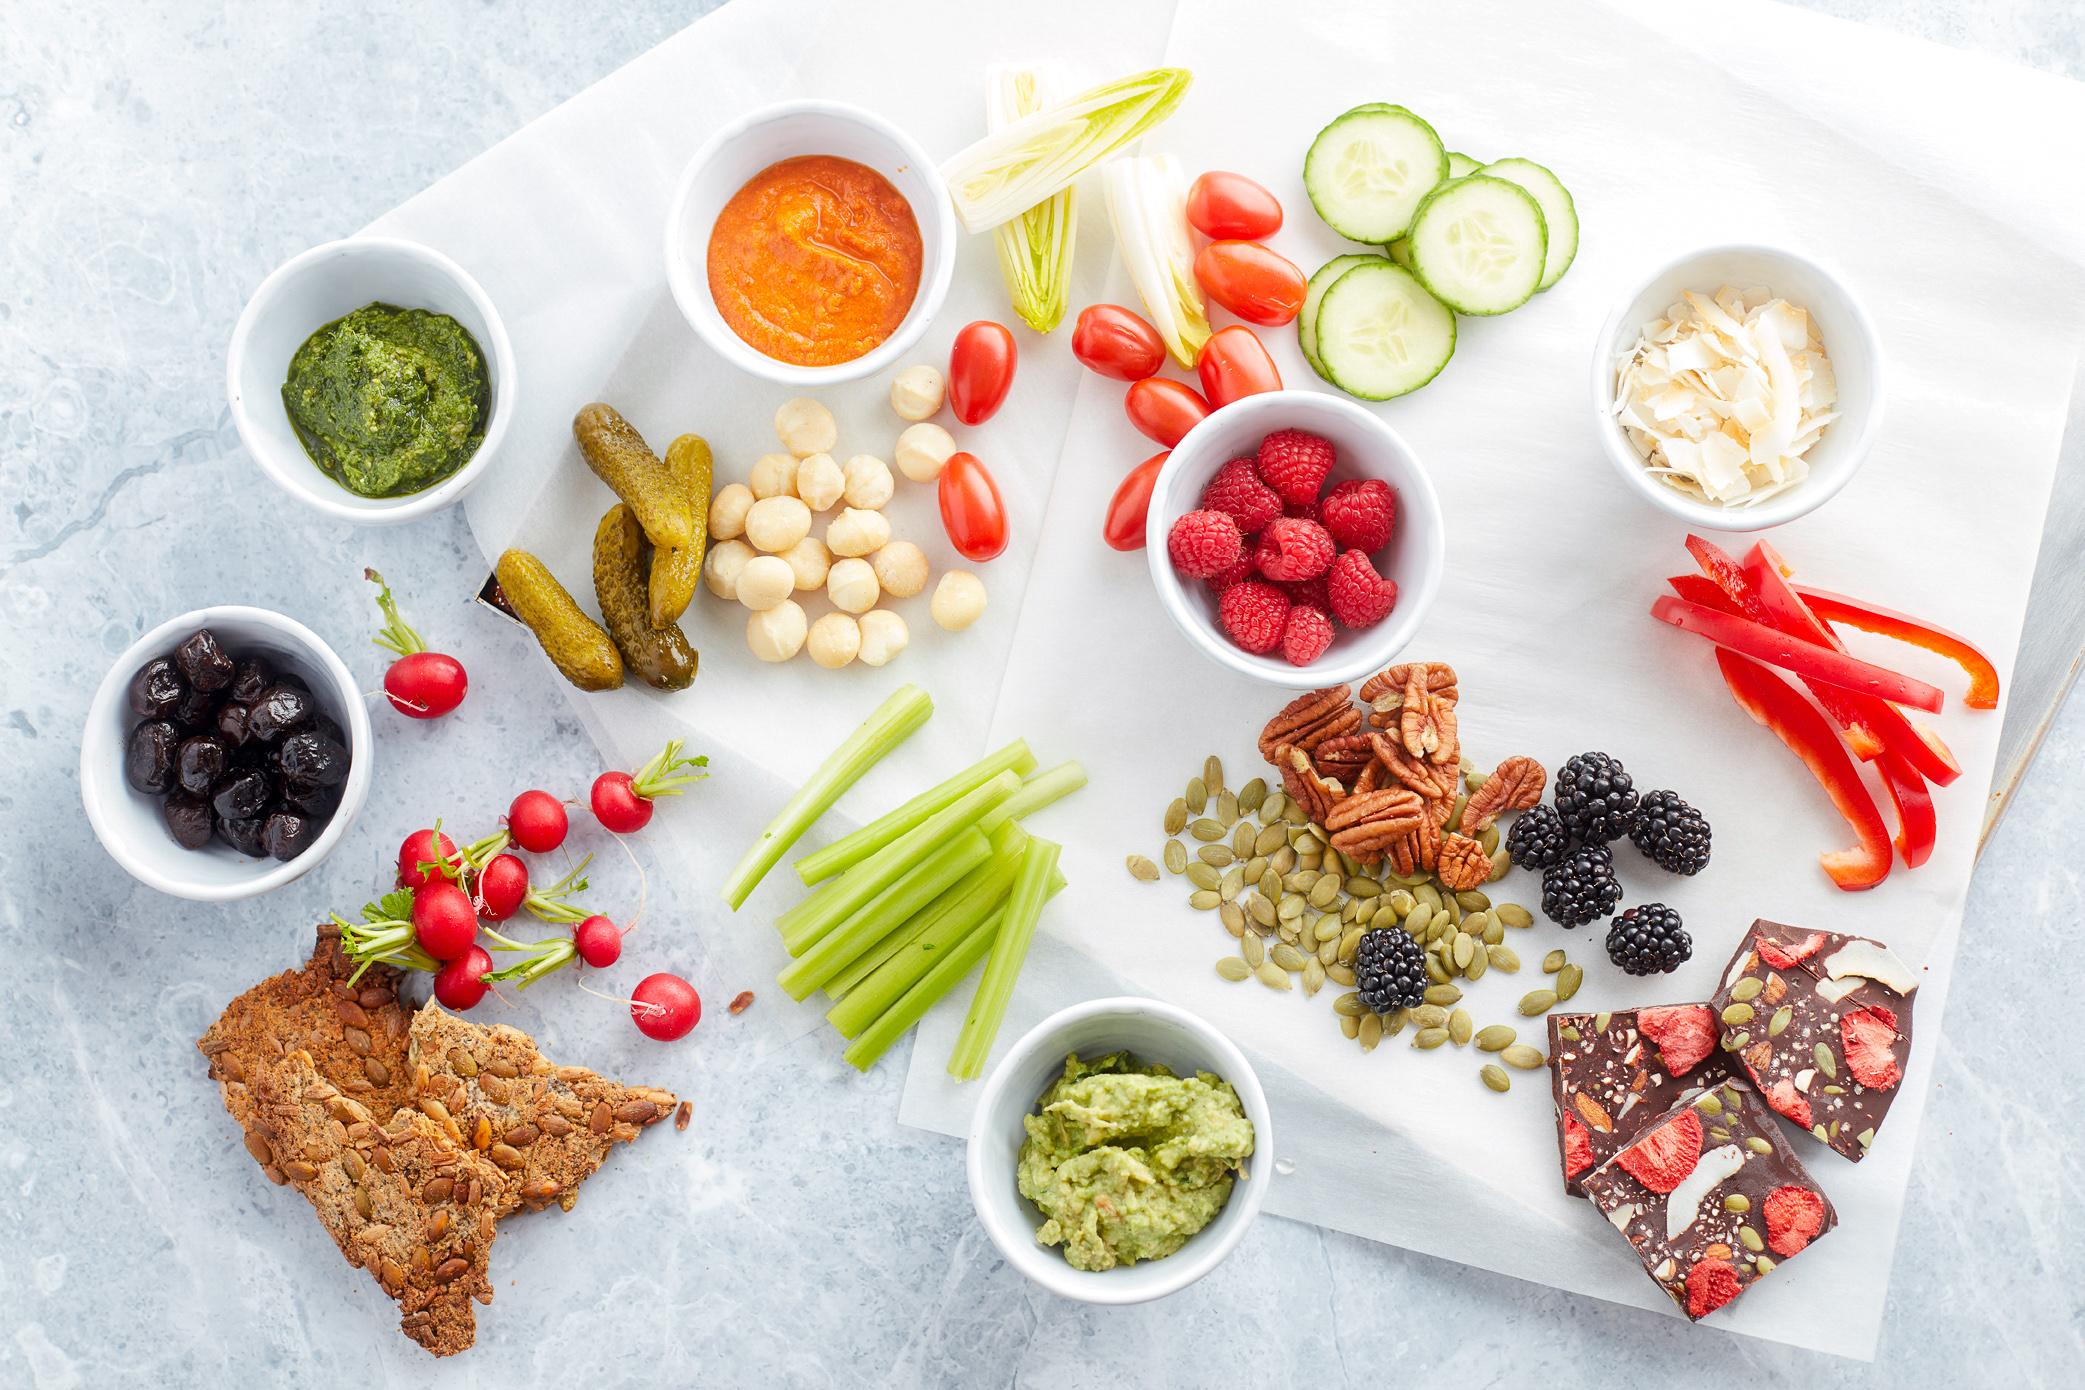 Easy Vegan Keto Snack Platter Low Carb Paleo Dairy Free